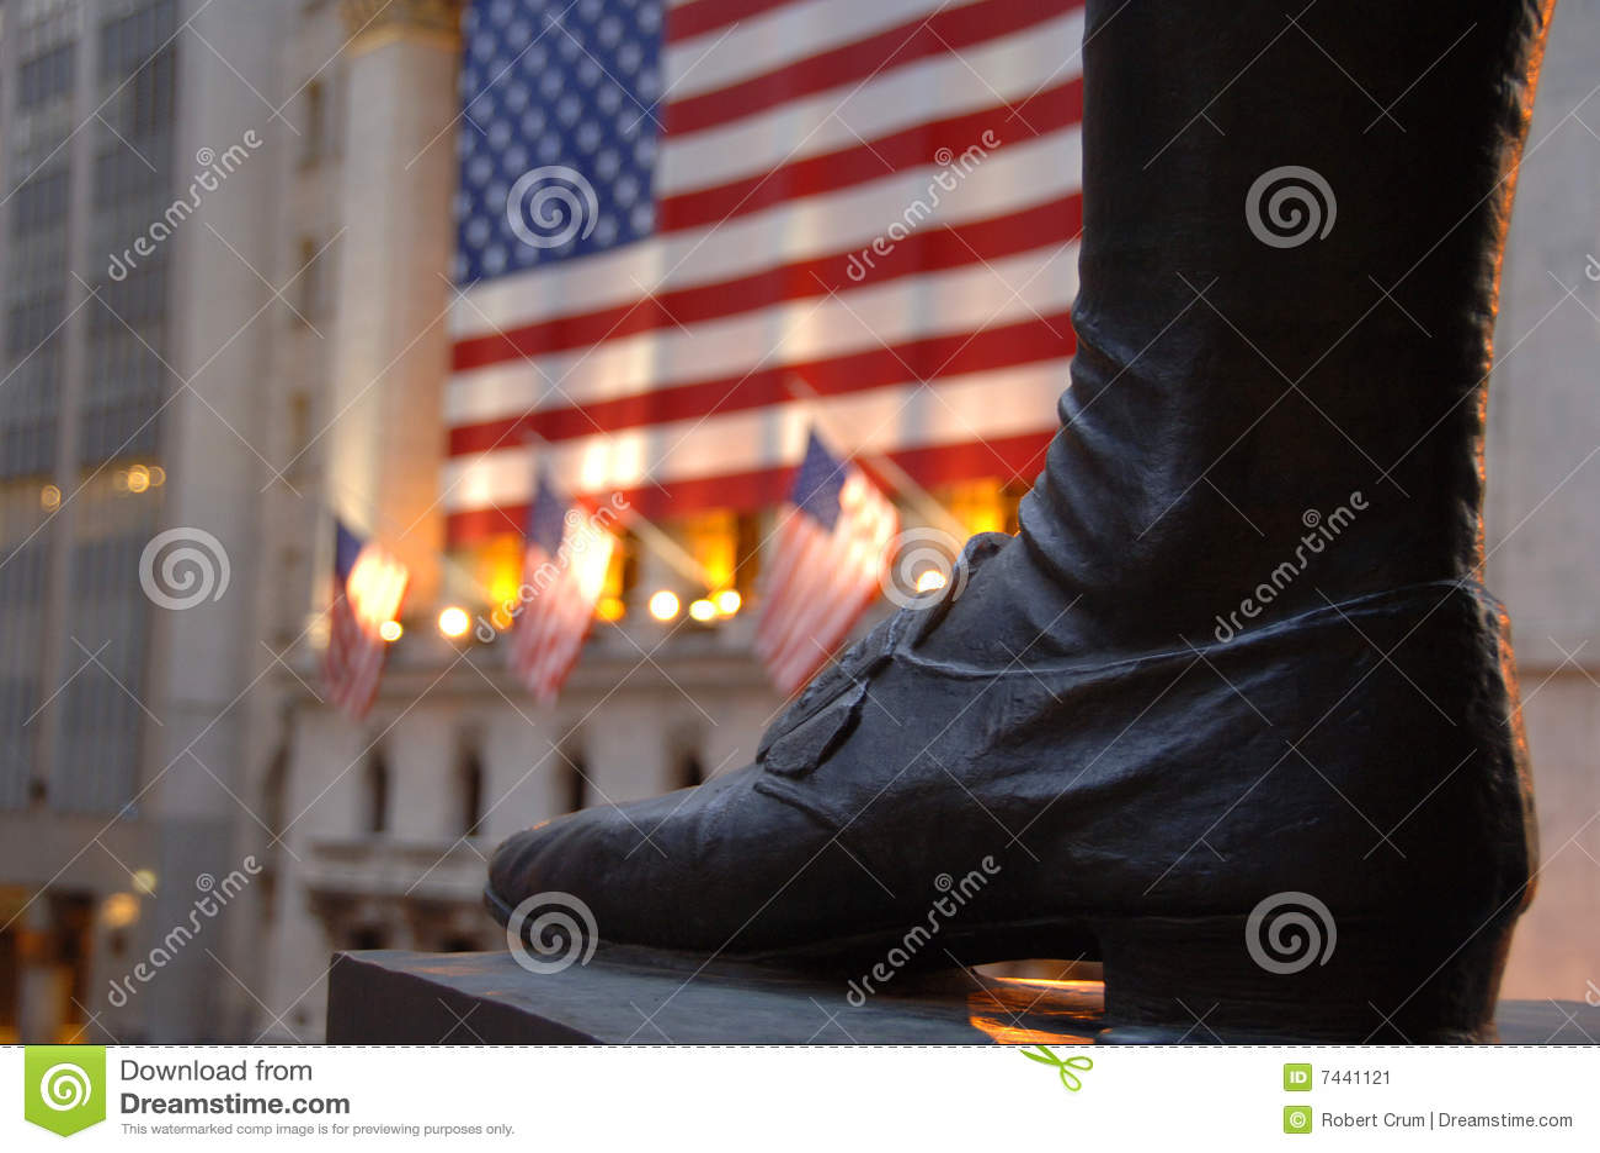 Foot of statue of George Washington on Wall Street